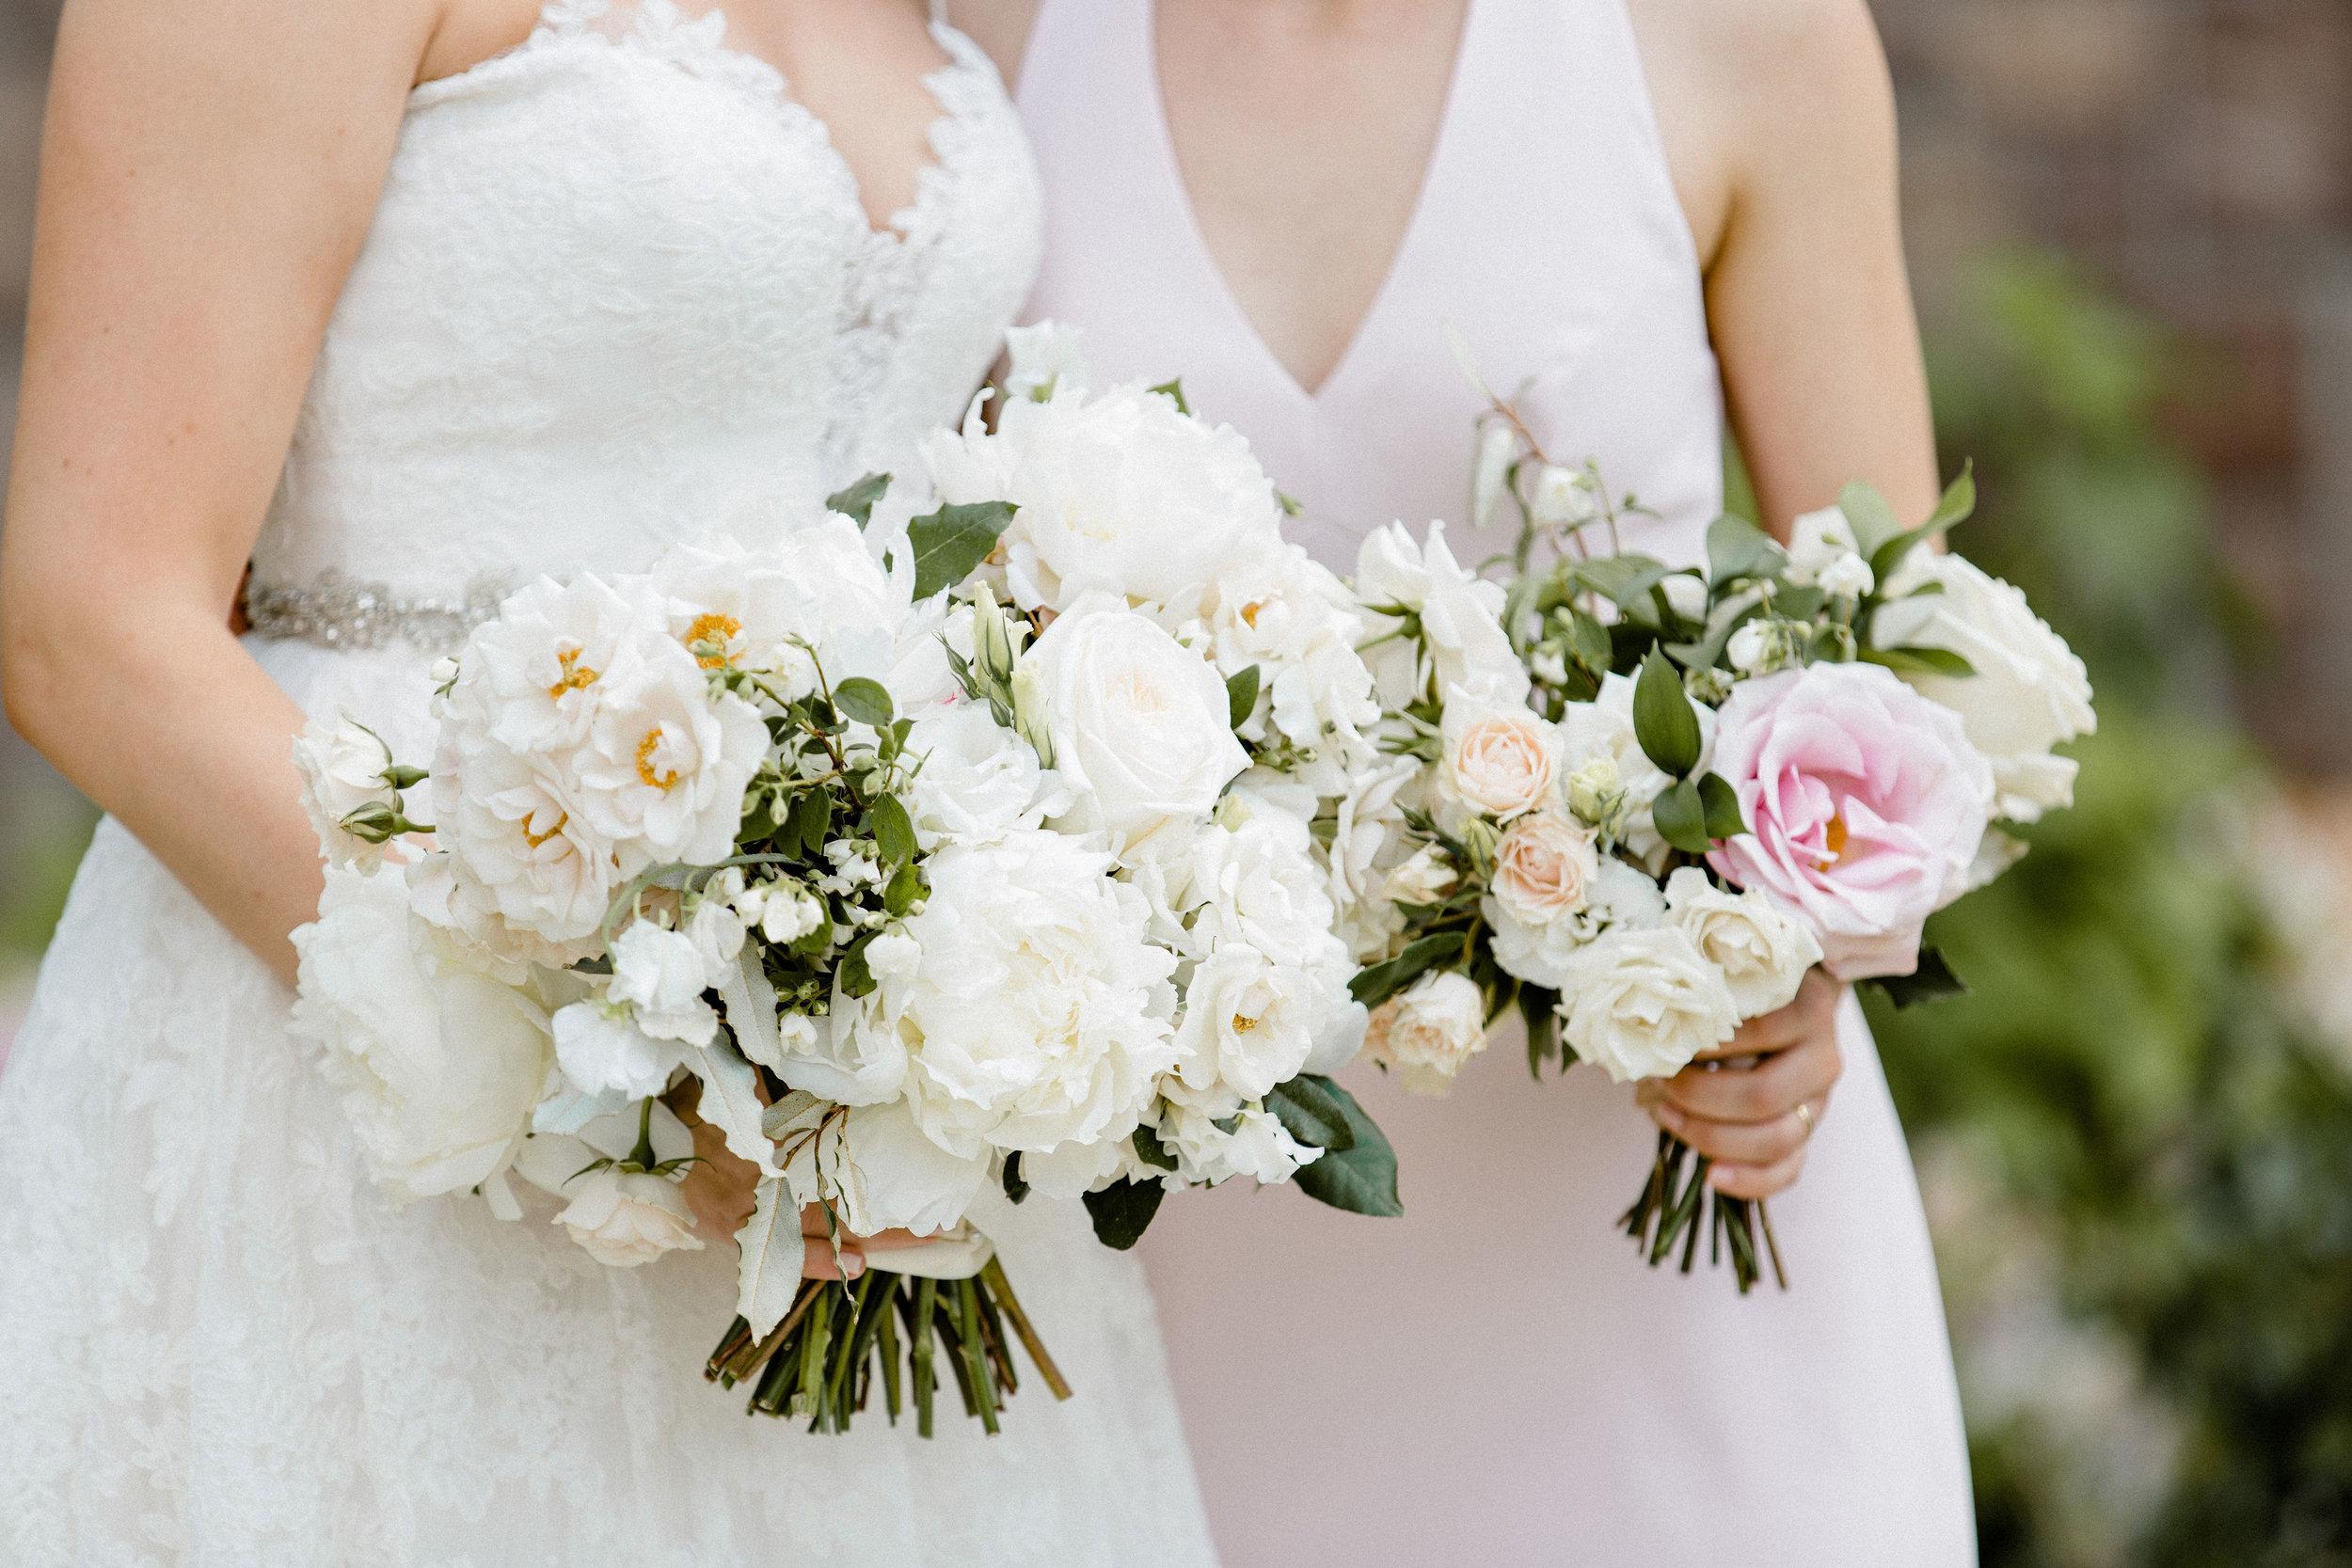 McElravey_Wedding_CarolineLimaPhotography_2018_158.jpg